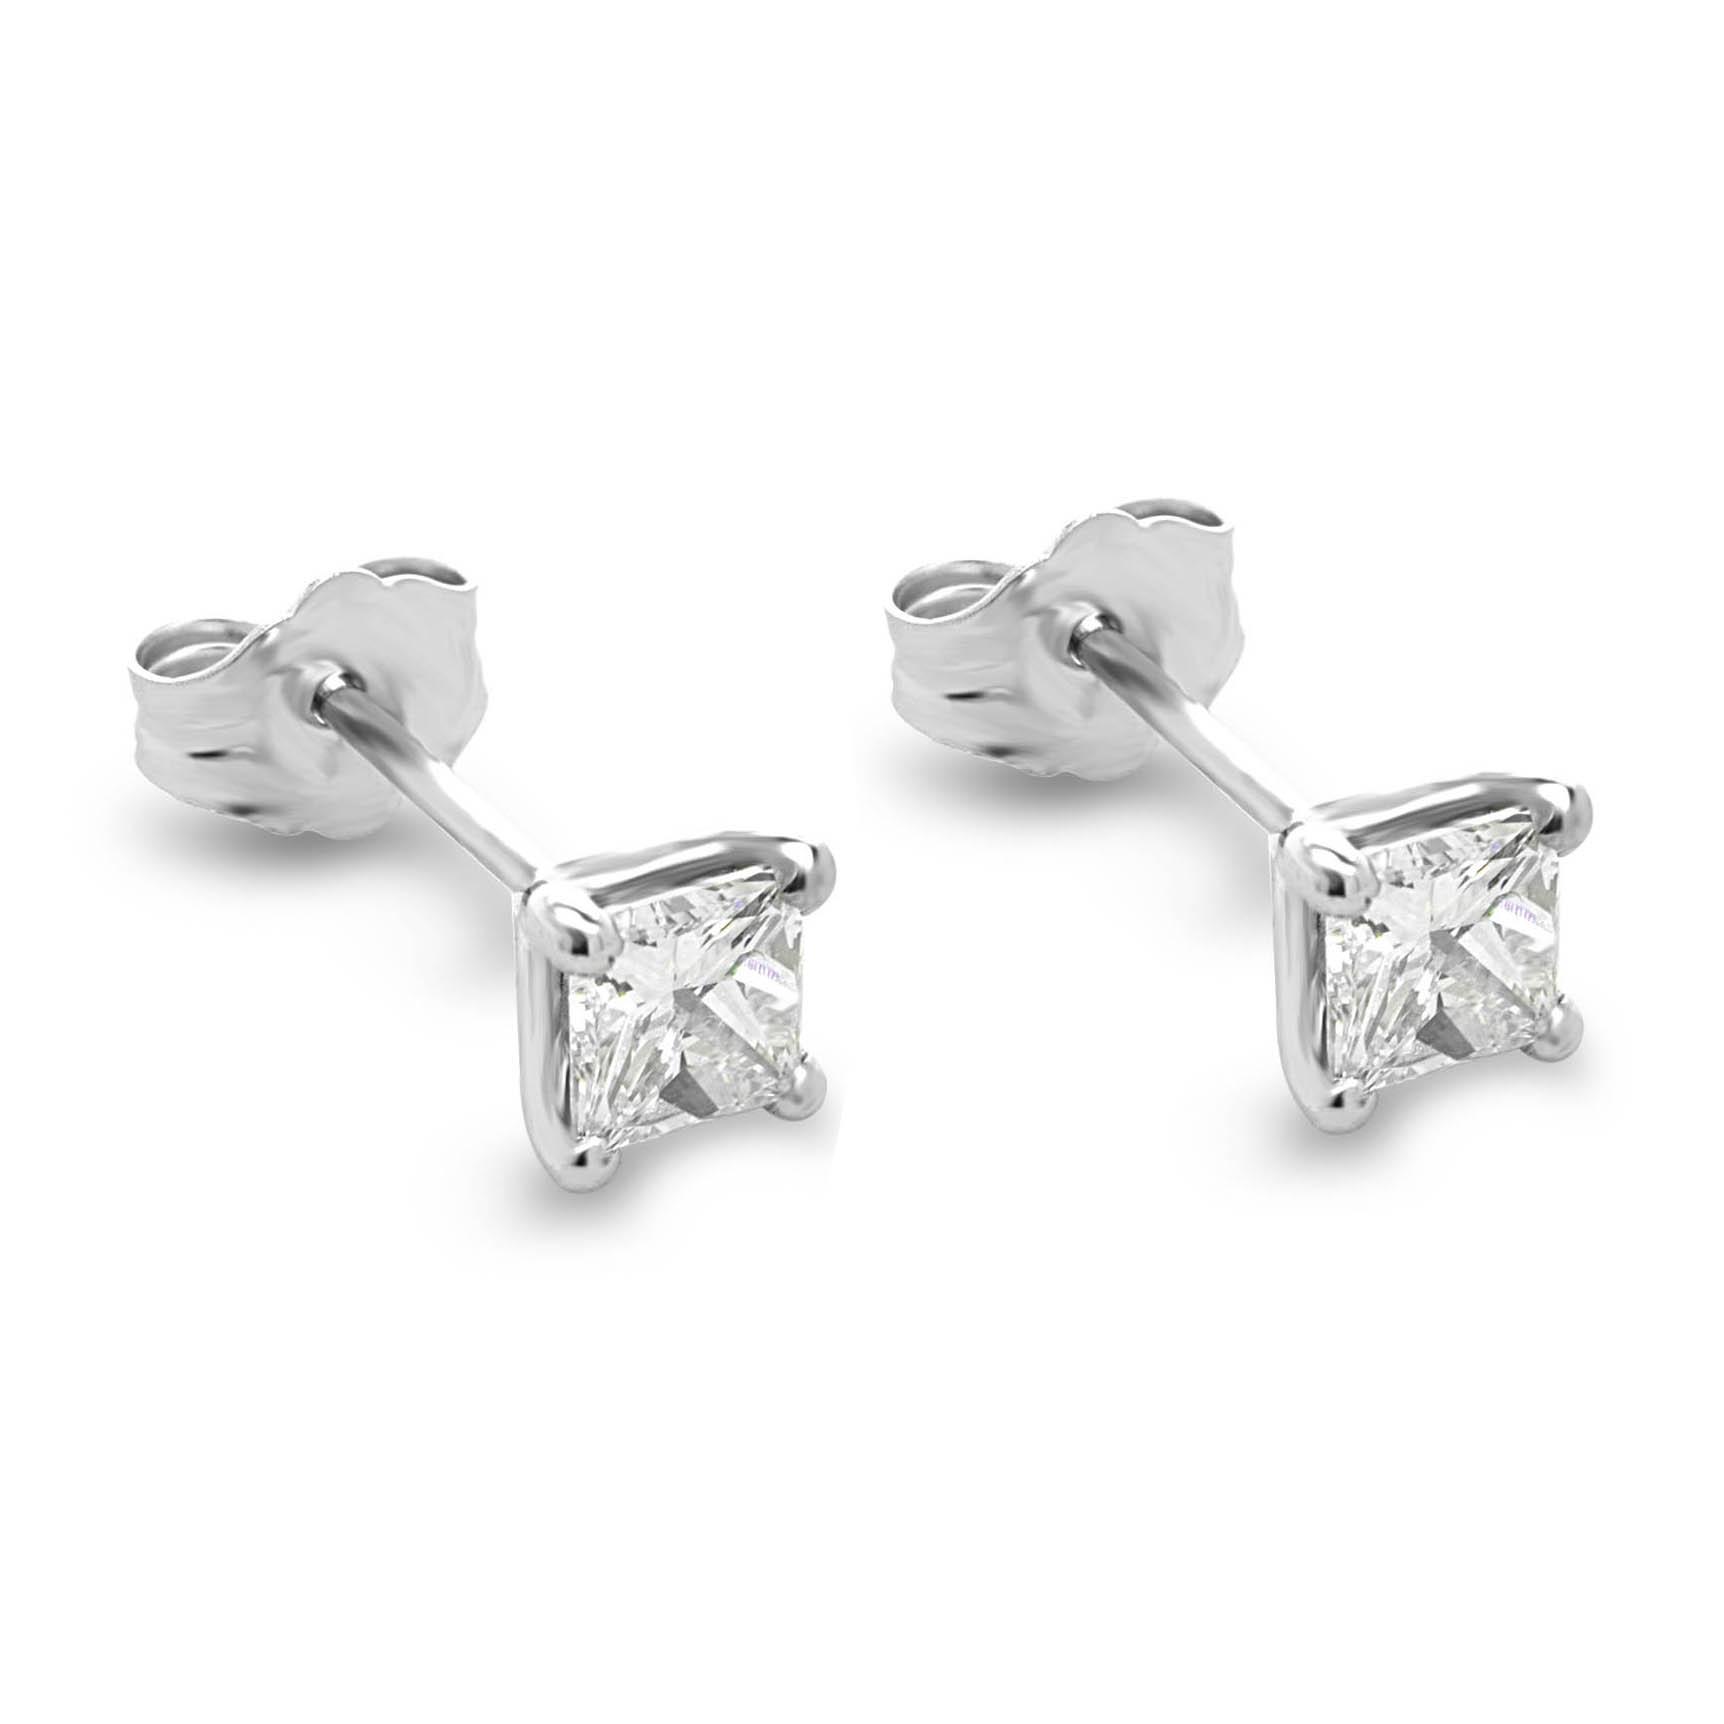 efa63d559 0.62 Carats Princess Cut Diamond Stud Earrings, Gold or Platinum ...